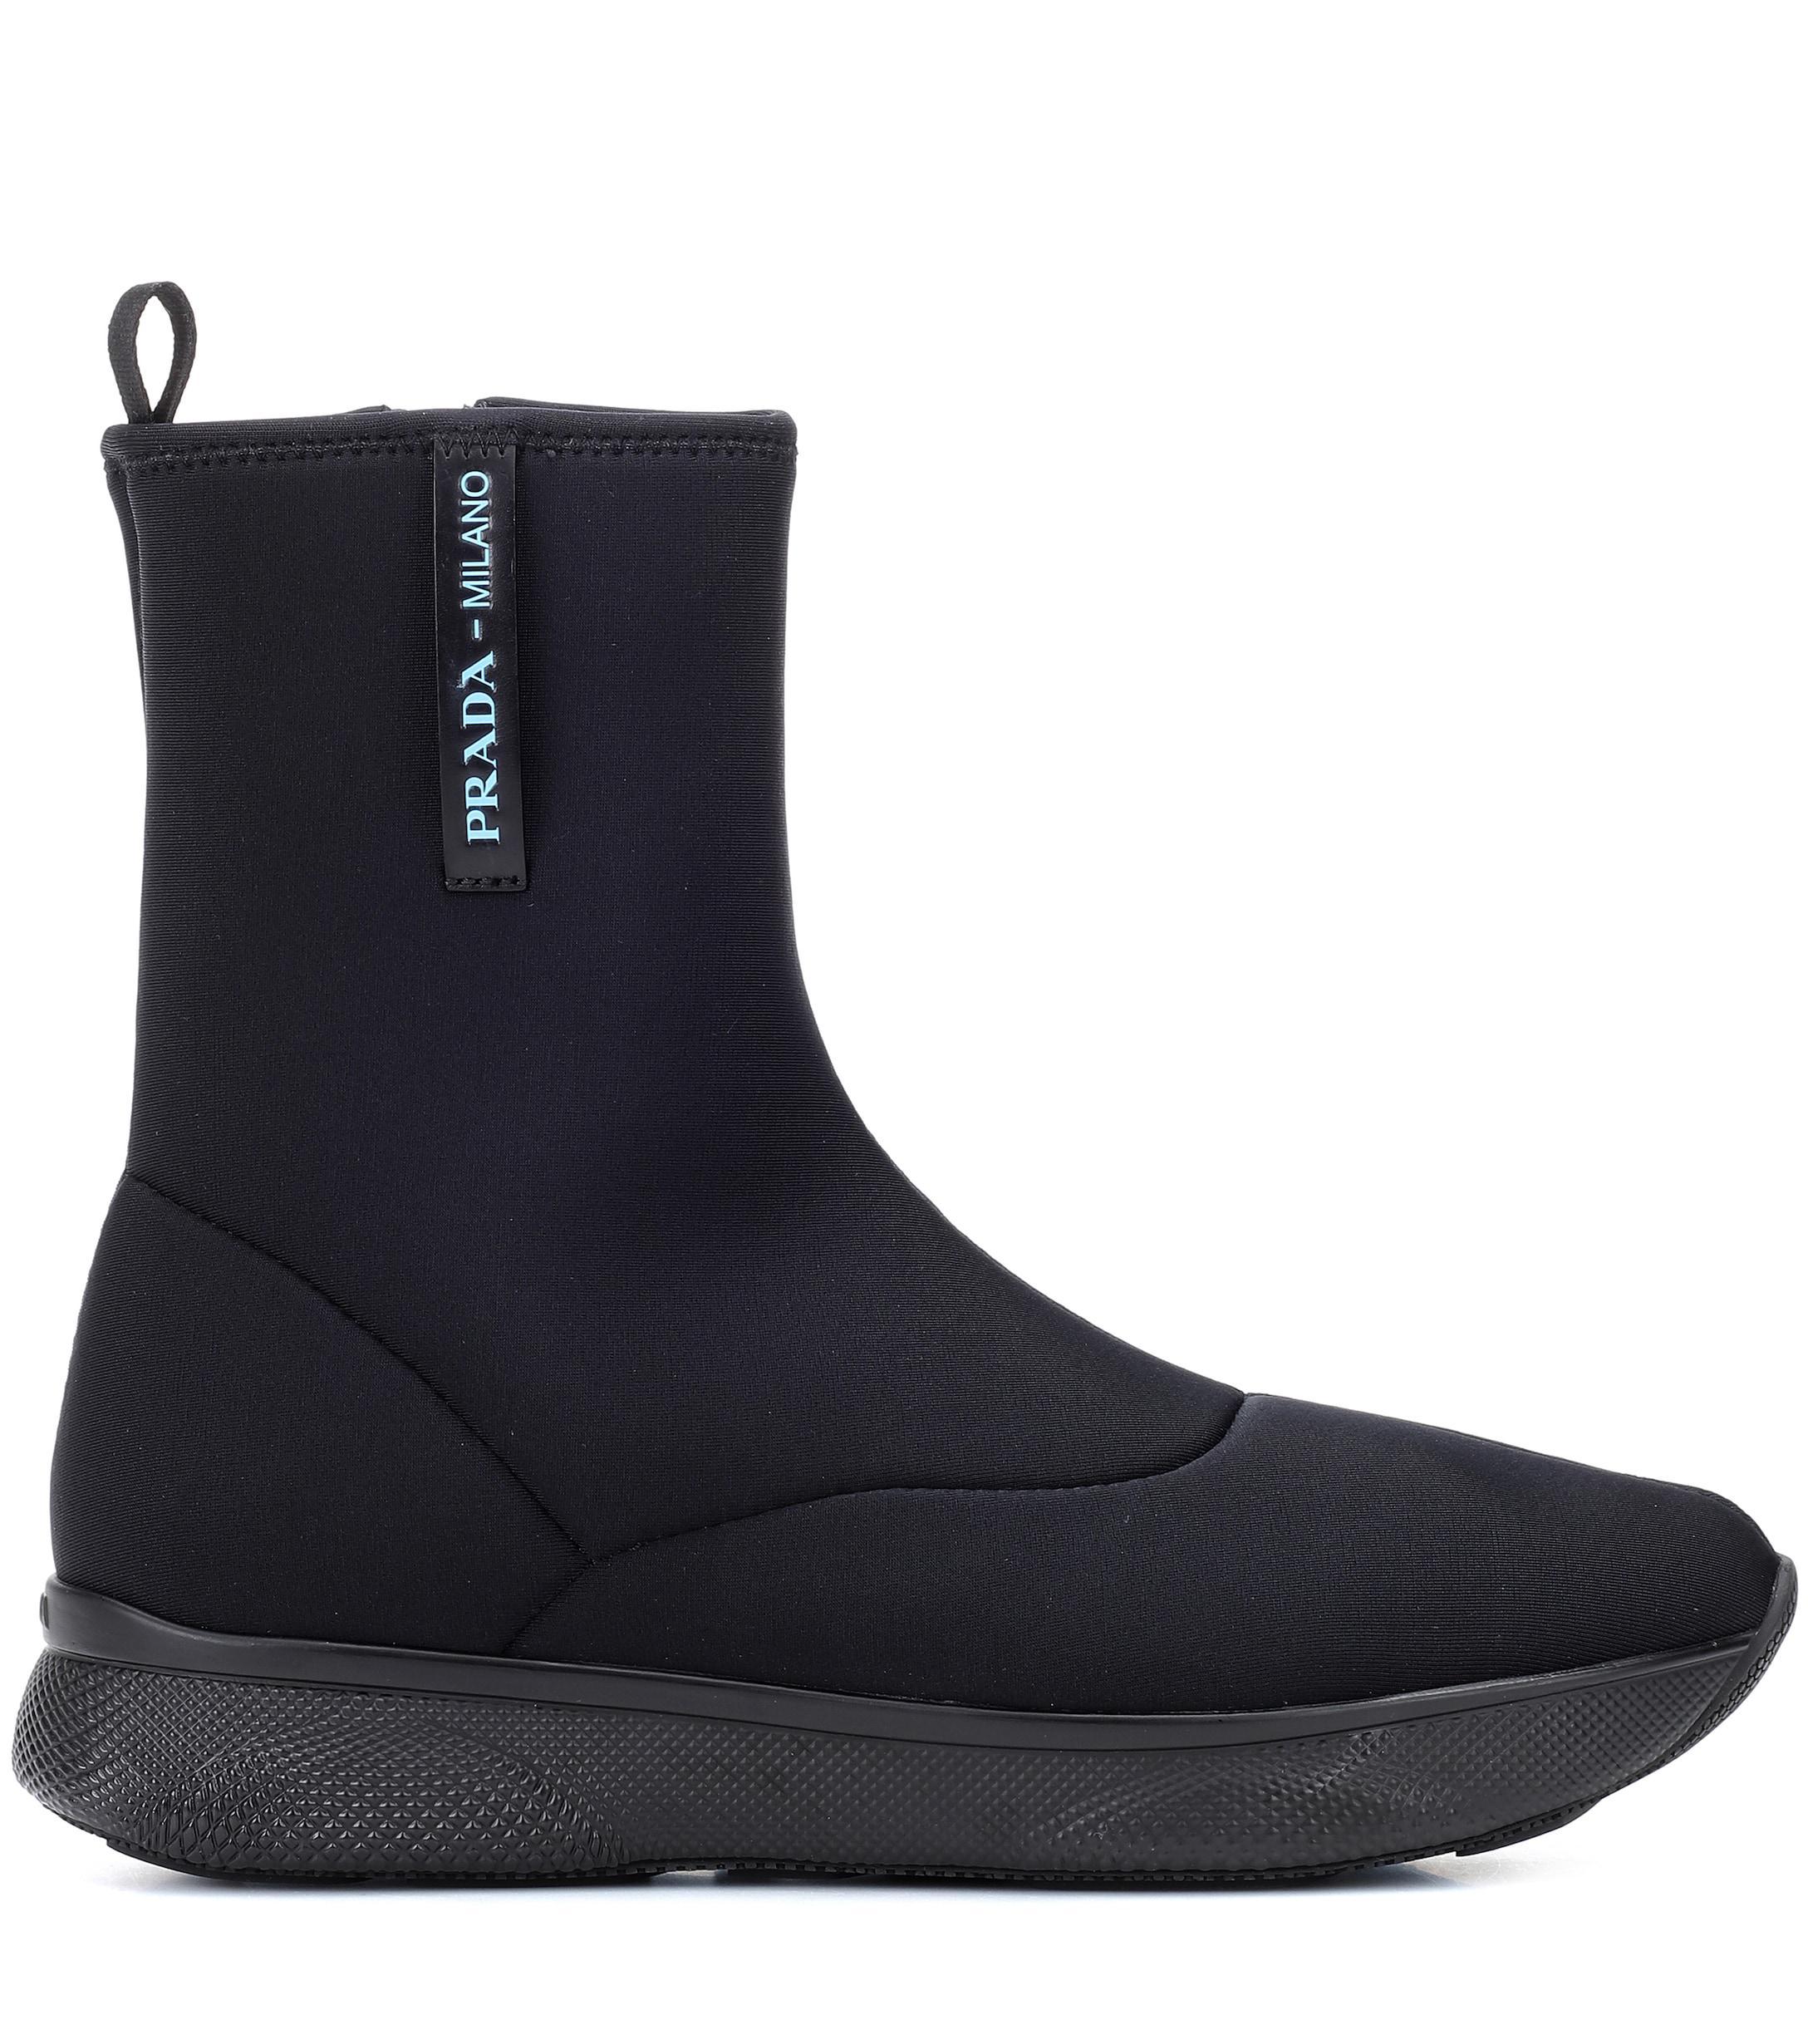 Prada Neoprene Ankle Boots Women in Black